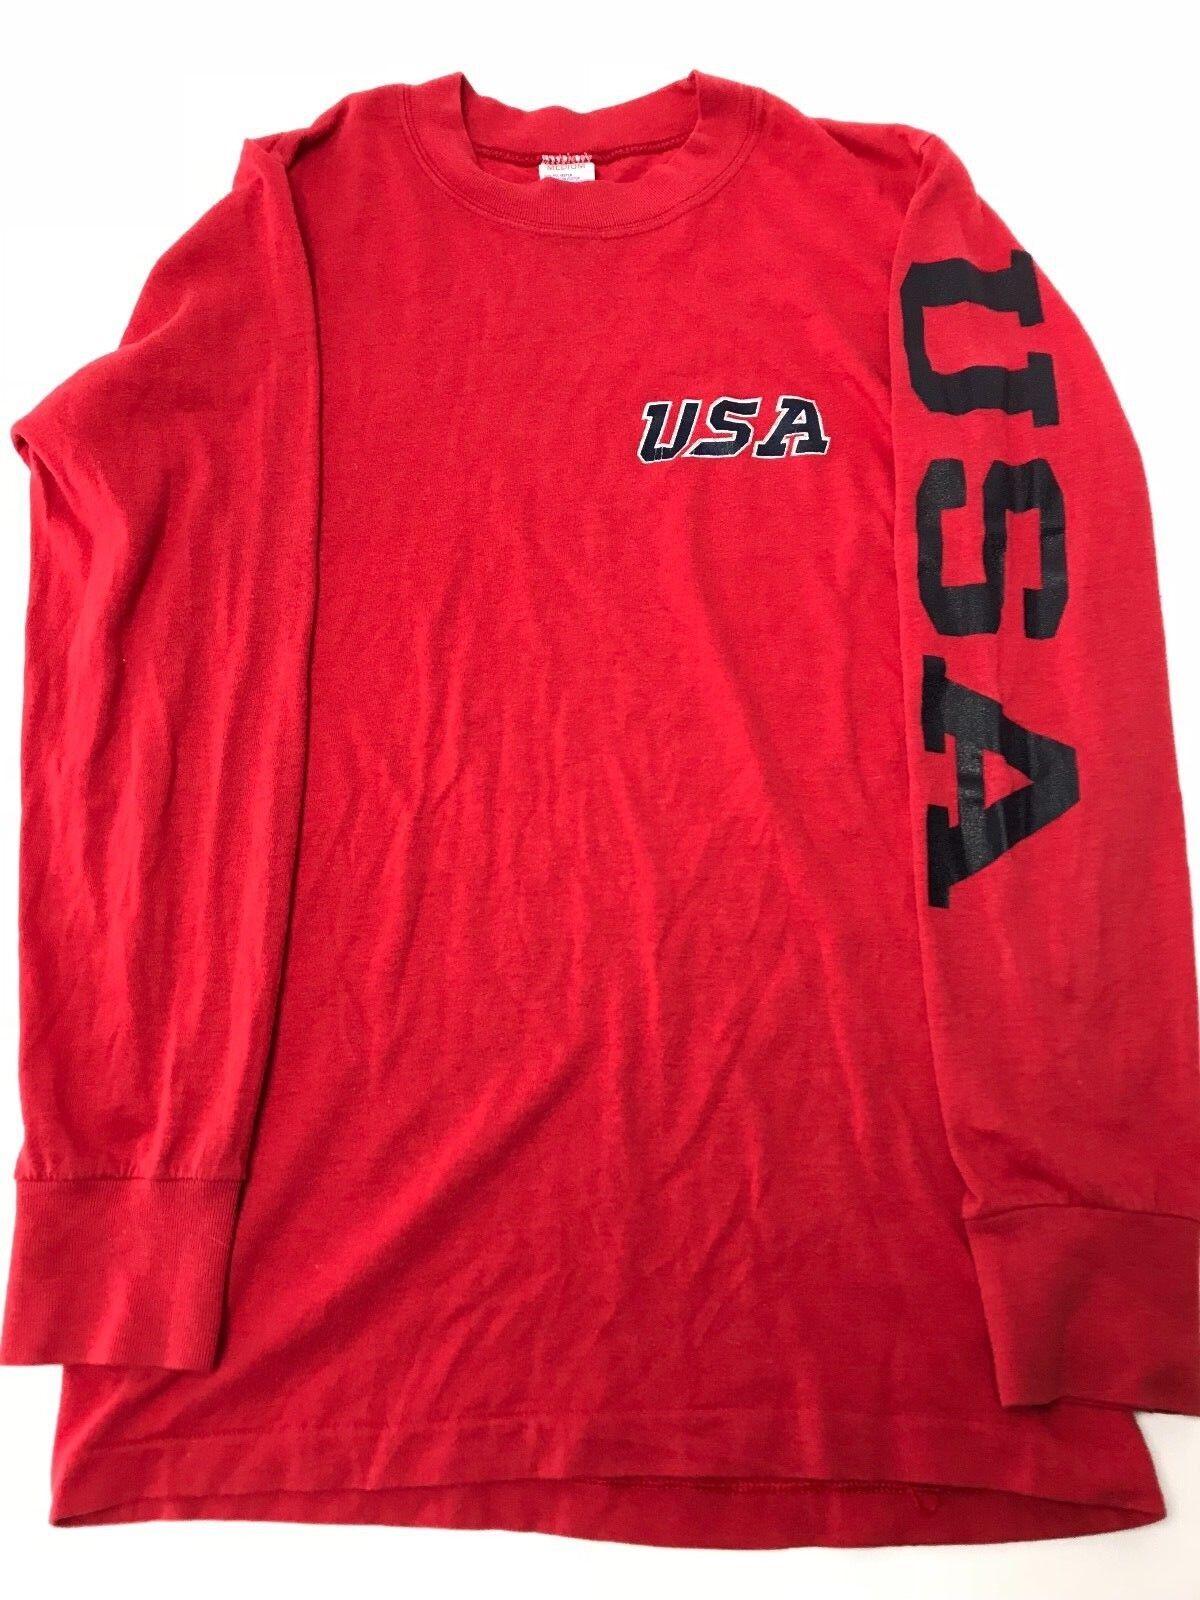 Vintage 1980s USA Champion Long Sleeve Single Stitch Shirt